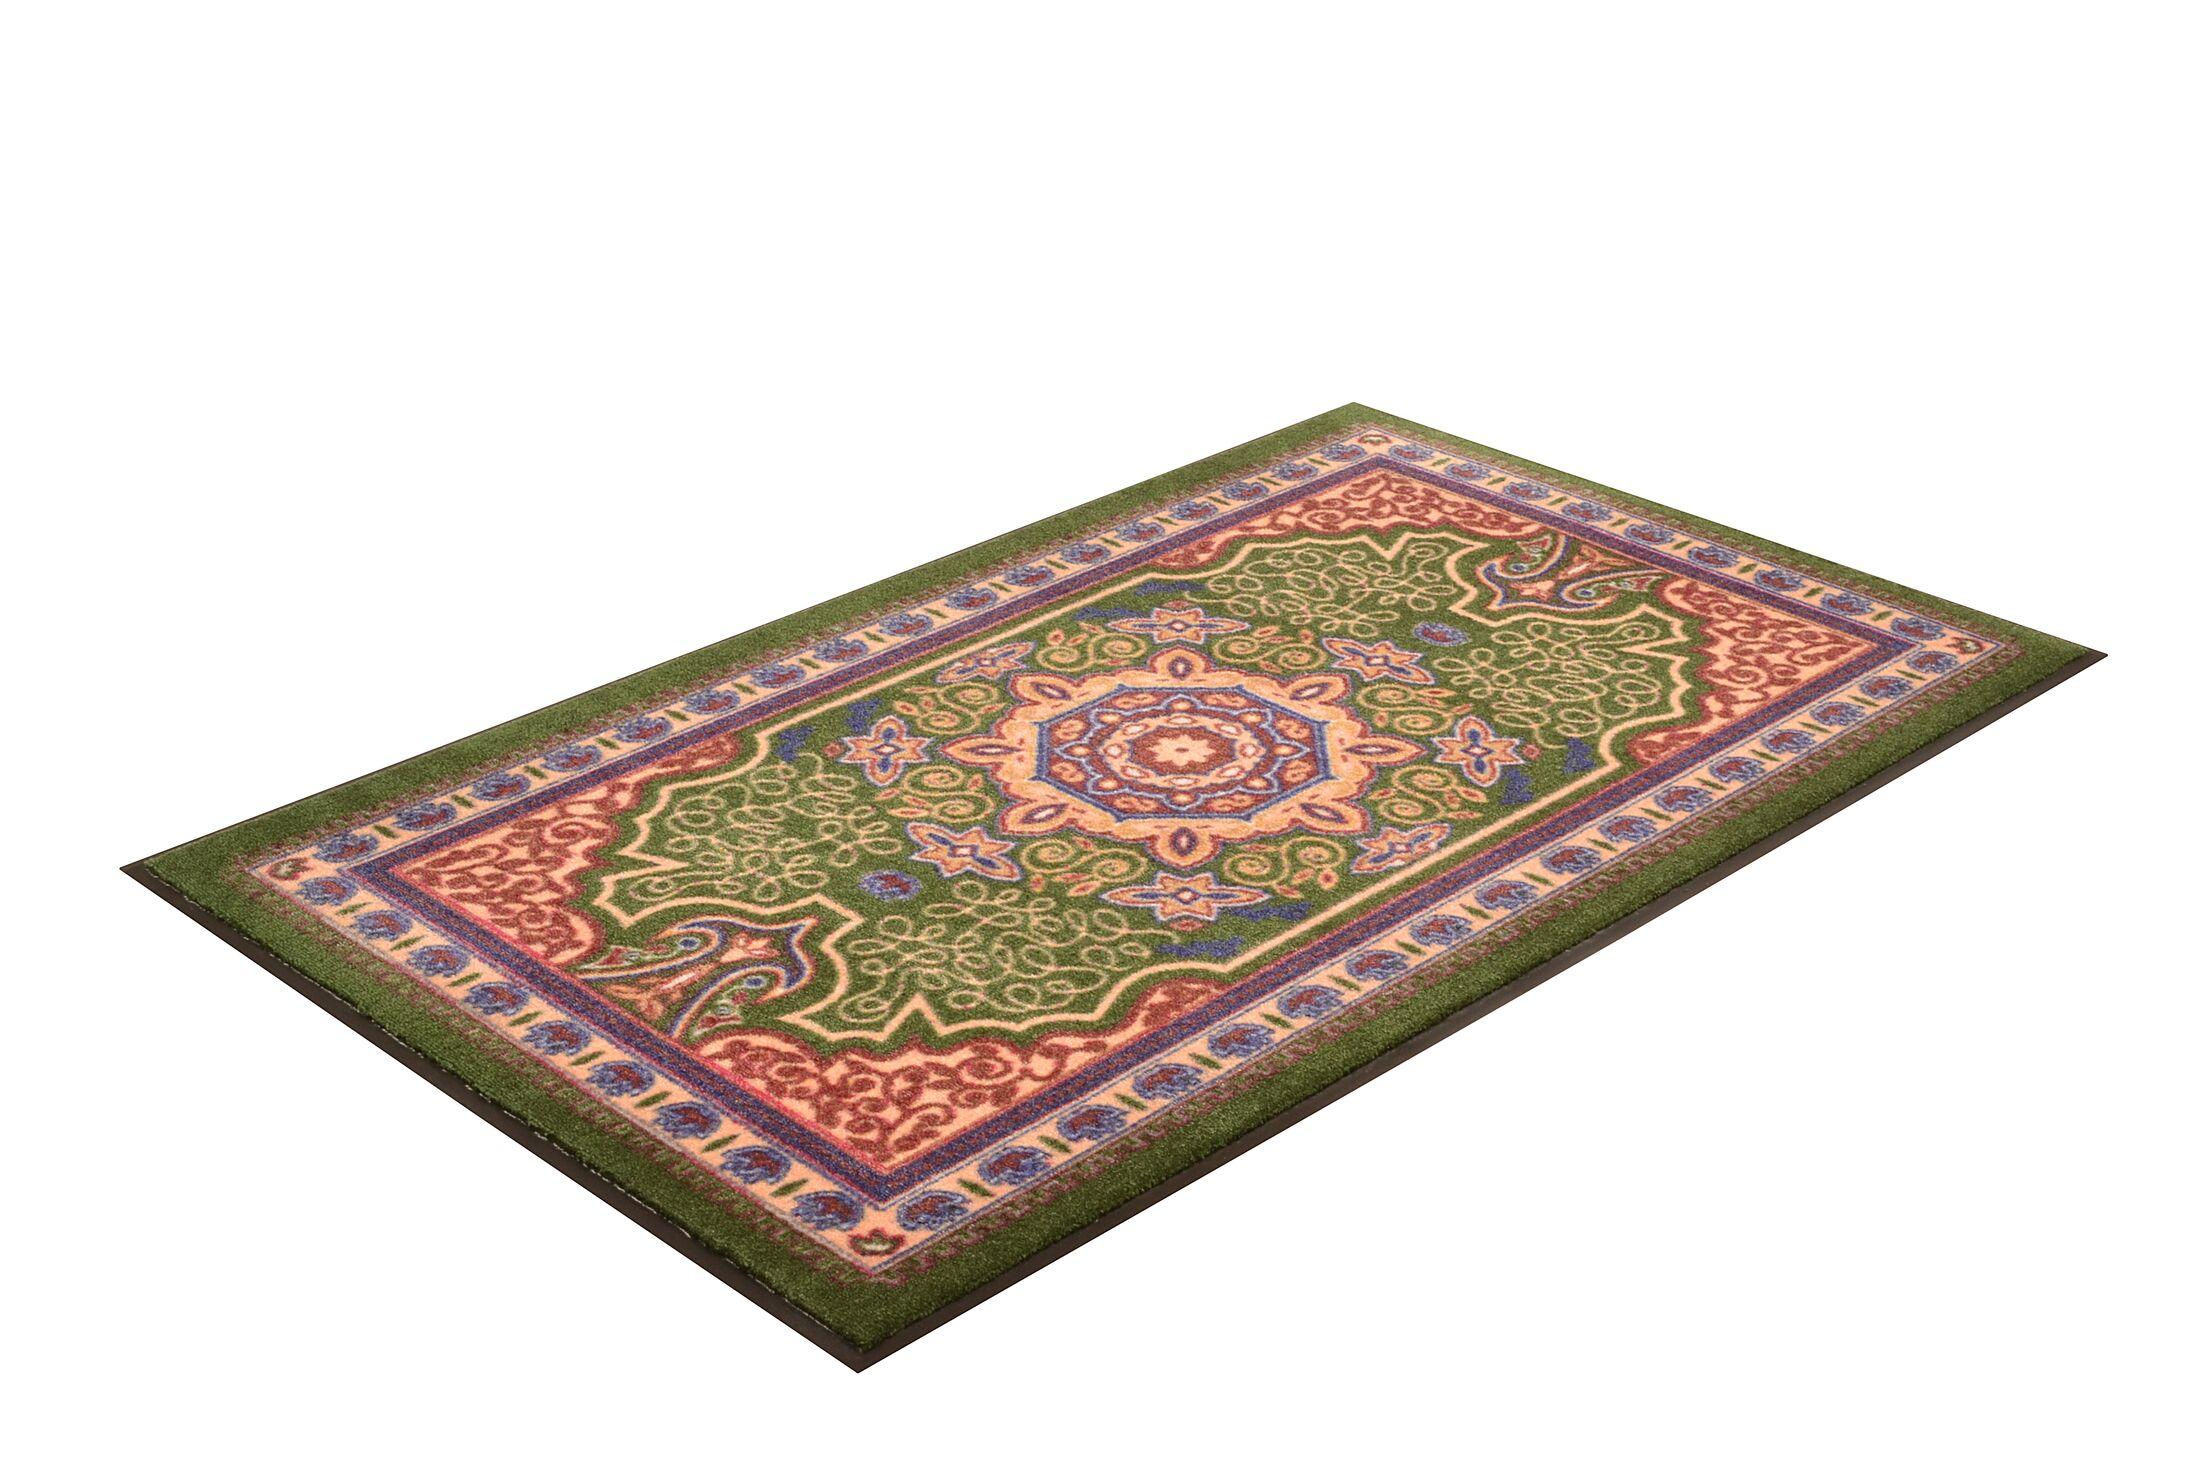 Orientrax Doormat Mat Size: Rectangle 4' x 12', Color: Emerald